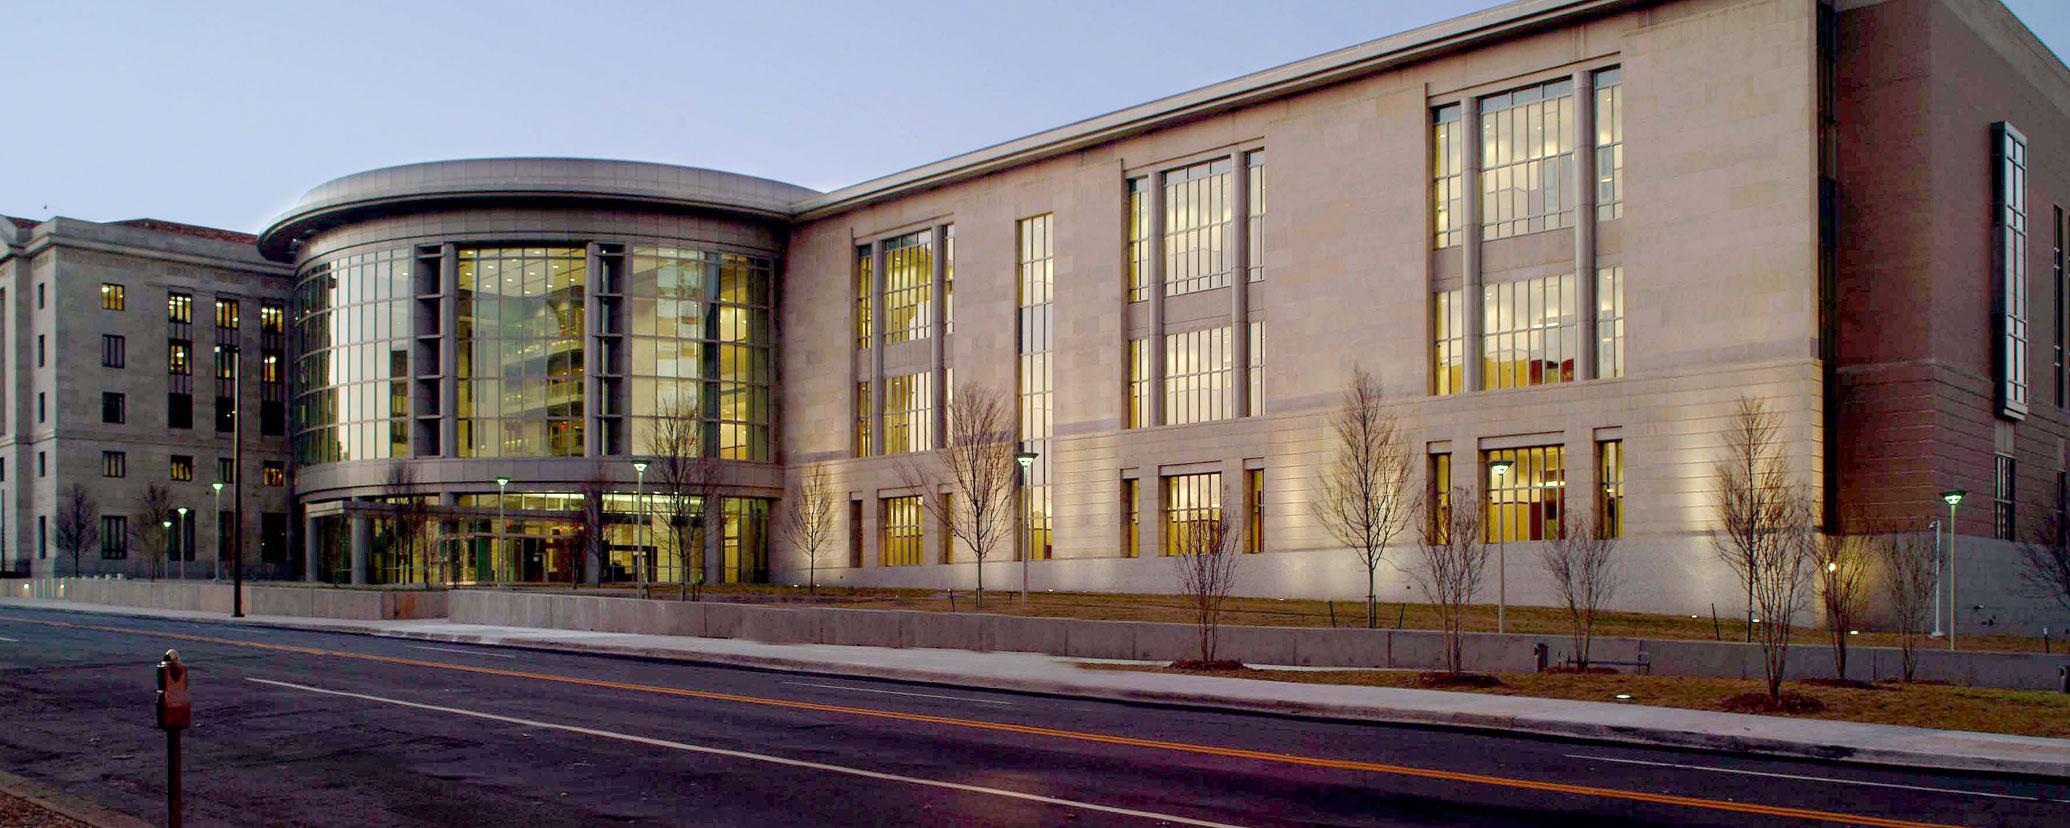 Caddell Construction - U.S. Courthouse, Little Rock, AR